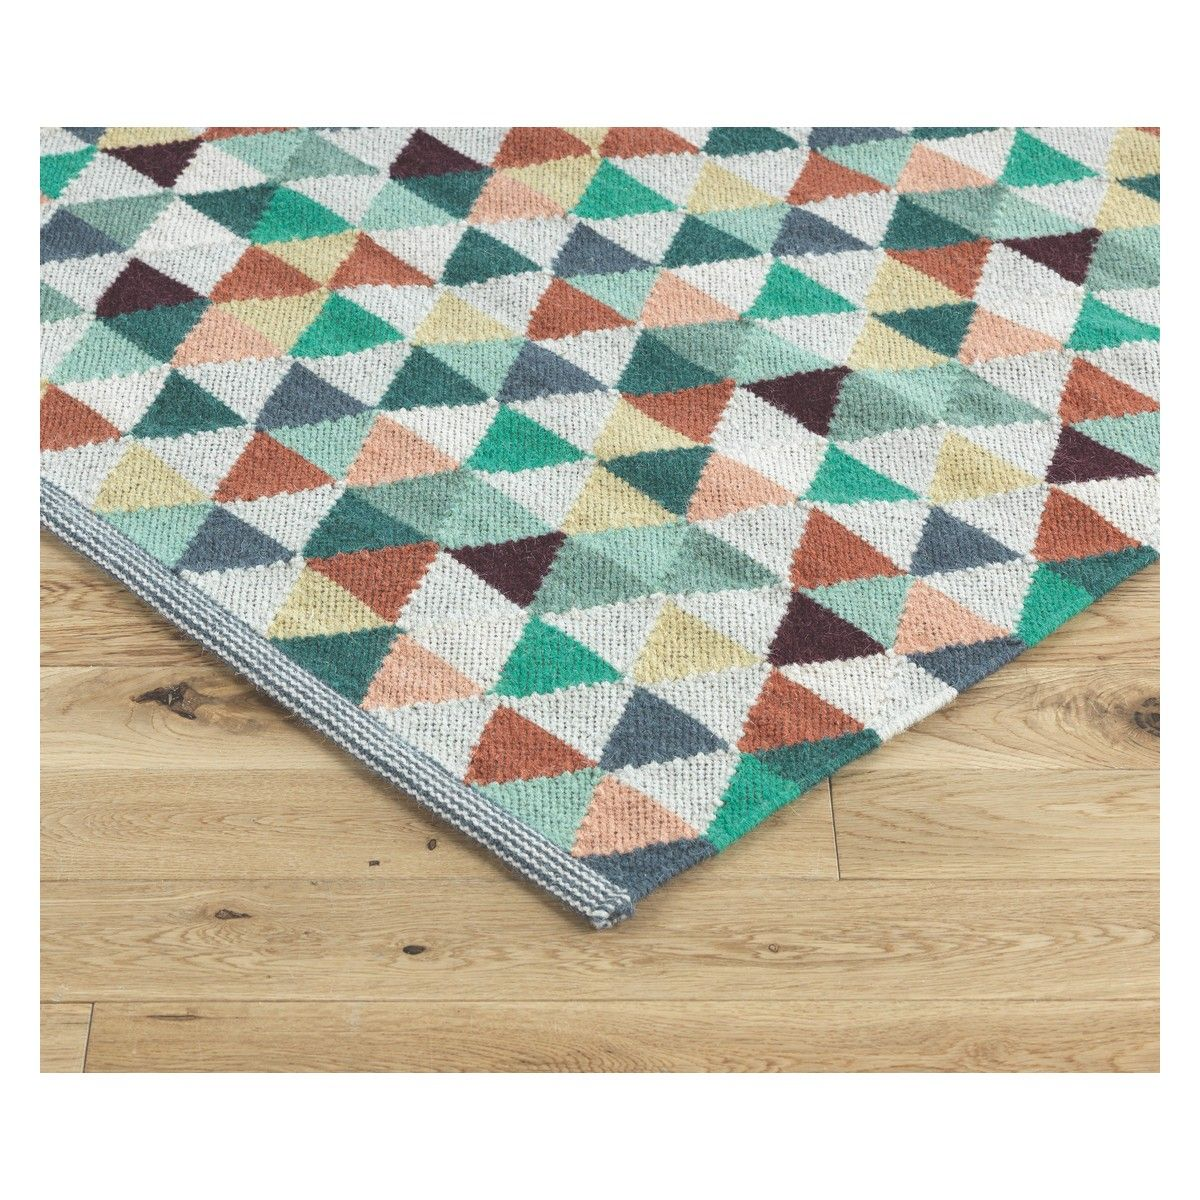 Kaleido Large Multi Coloured Flat Weave Wool Rug 170x240 Buy Now At Habitat Uk Flat Weave Wool Rug Rugs Embroidered Cushions